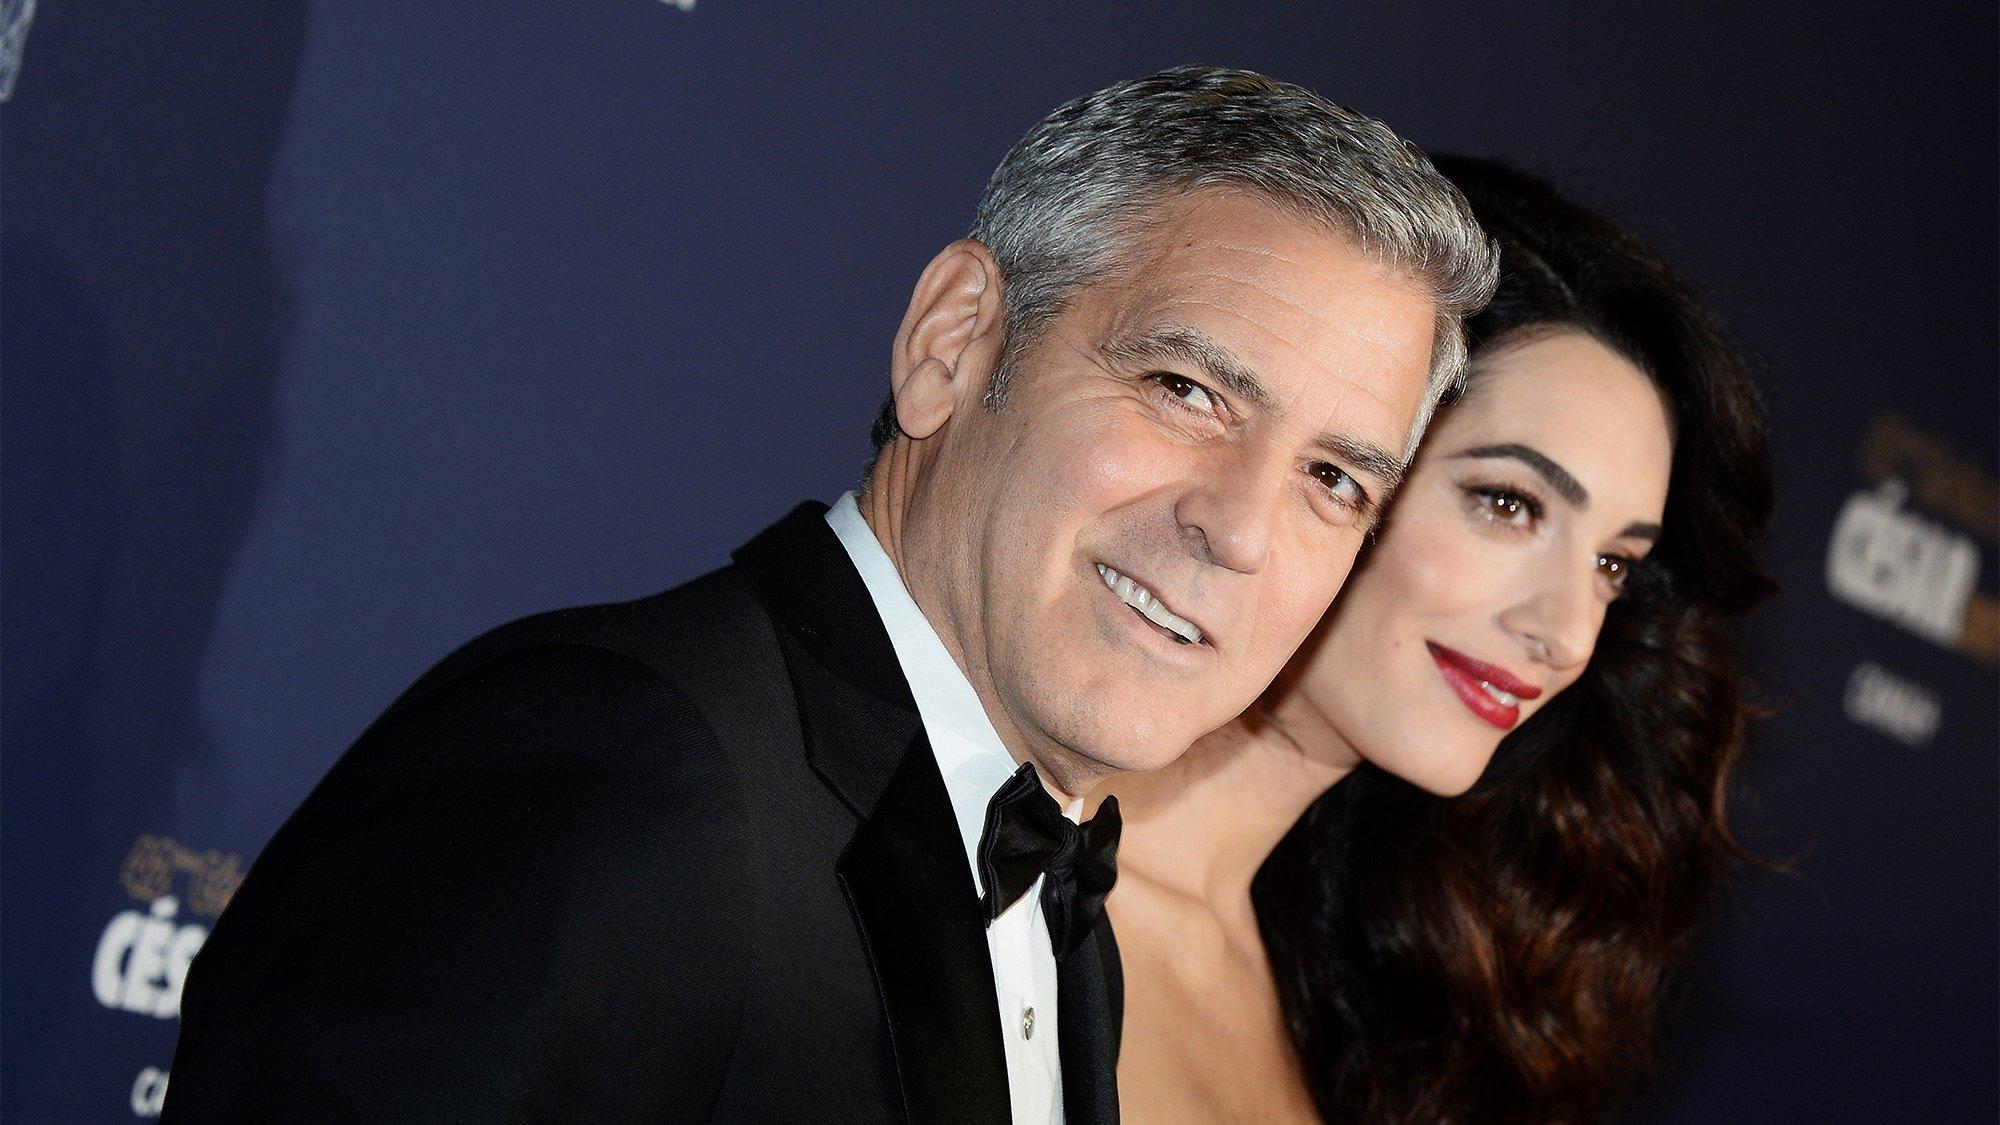 Matt Damon admits George Clooney is nervous about parenthood https://t.co/flJgeH35j5 https://t.co/NR80yZSrKZ